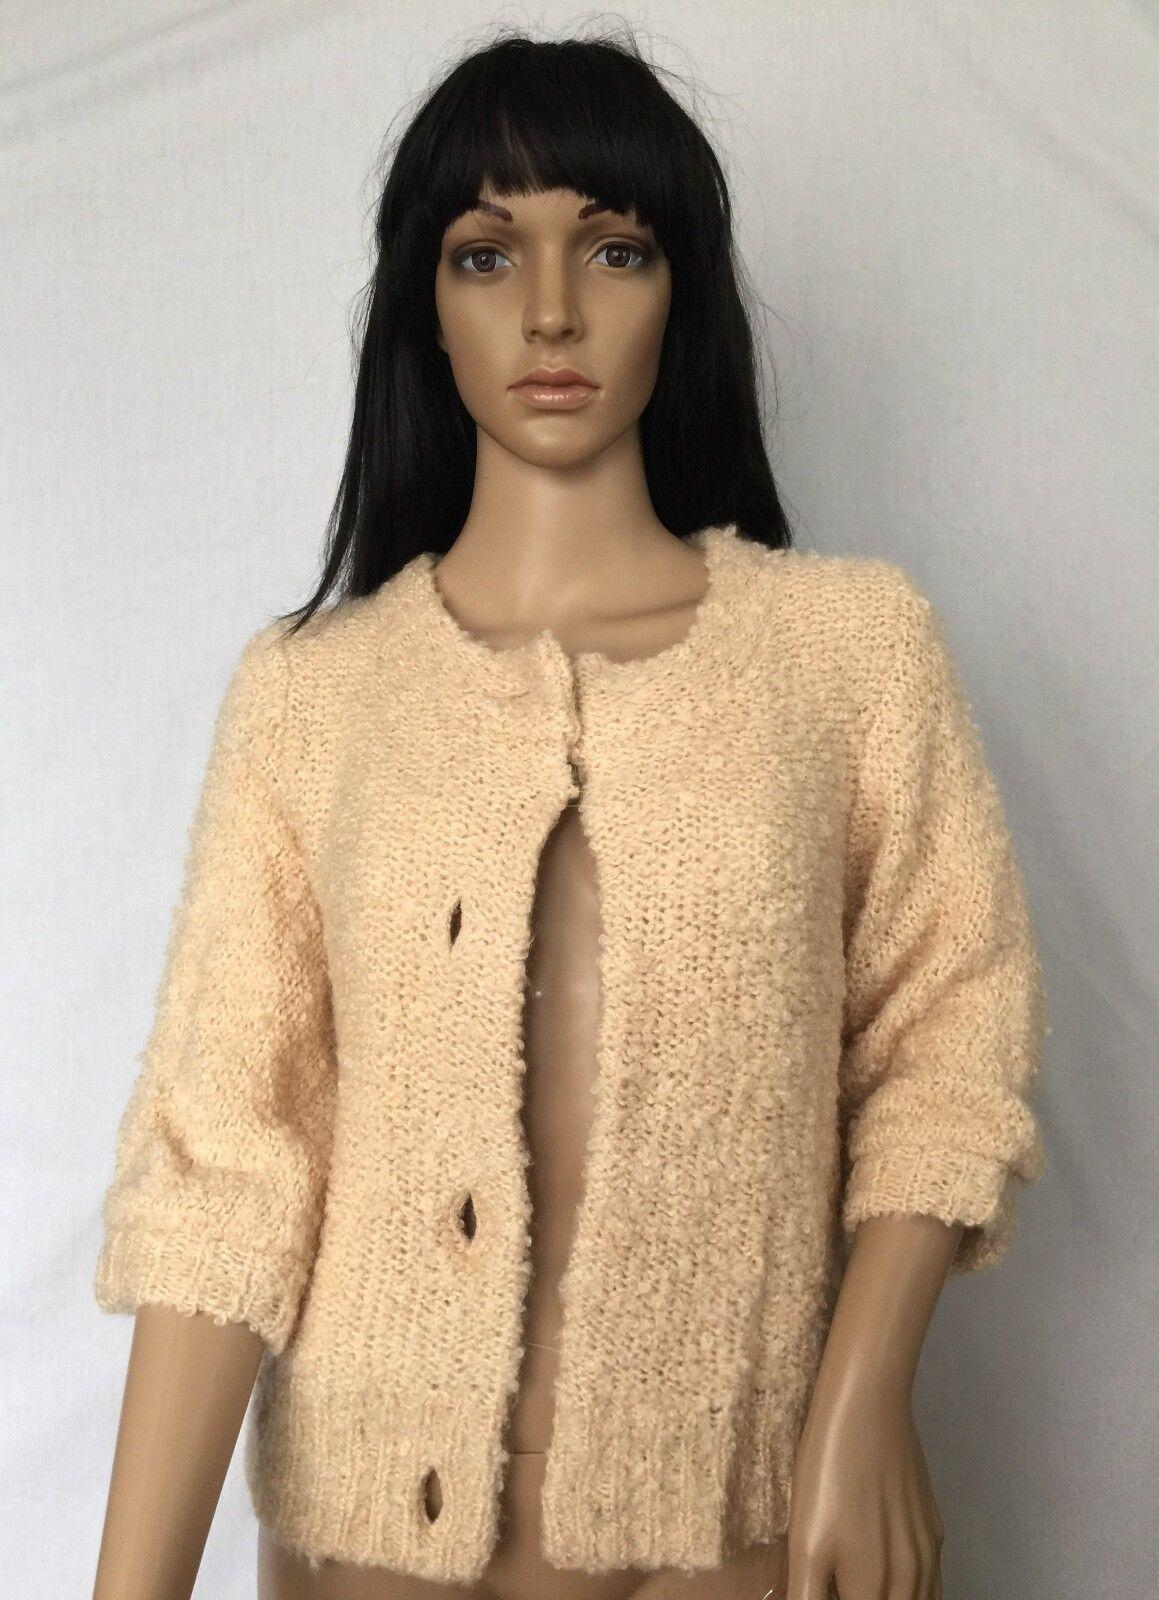 New Anthropologie HWR Cardigan Sweater Sz S 4-6